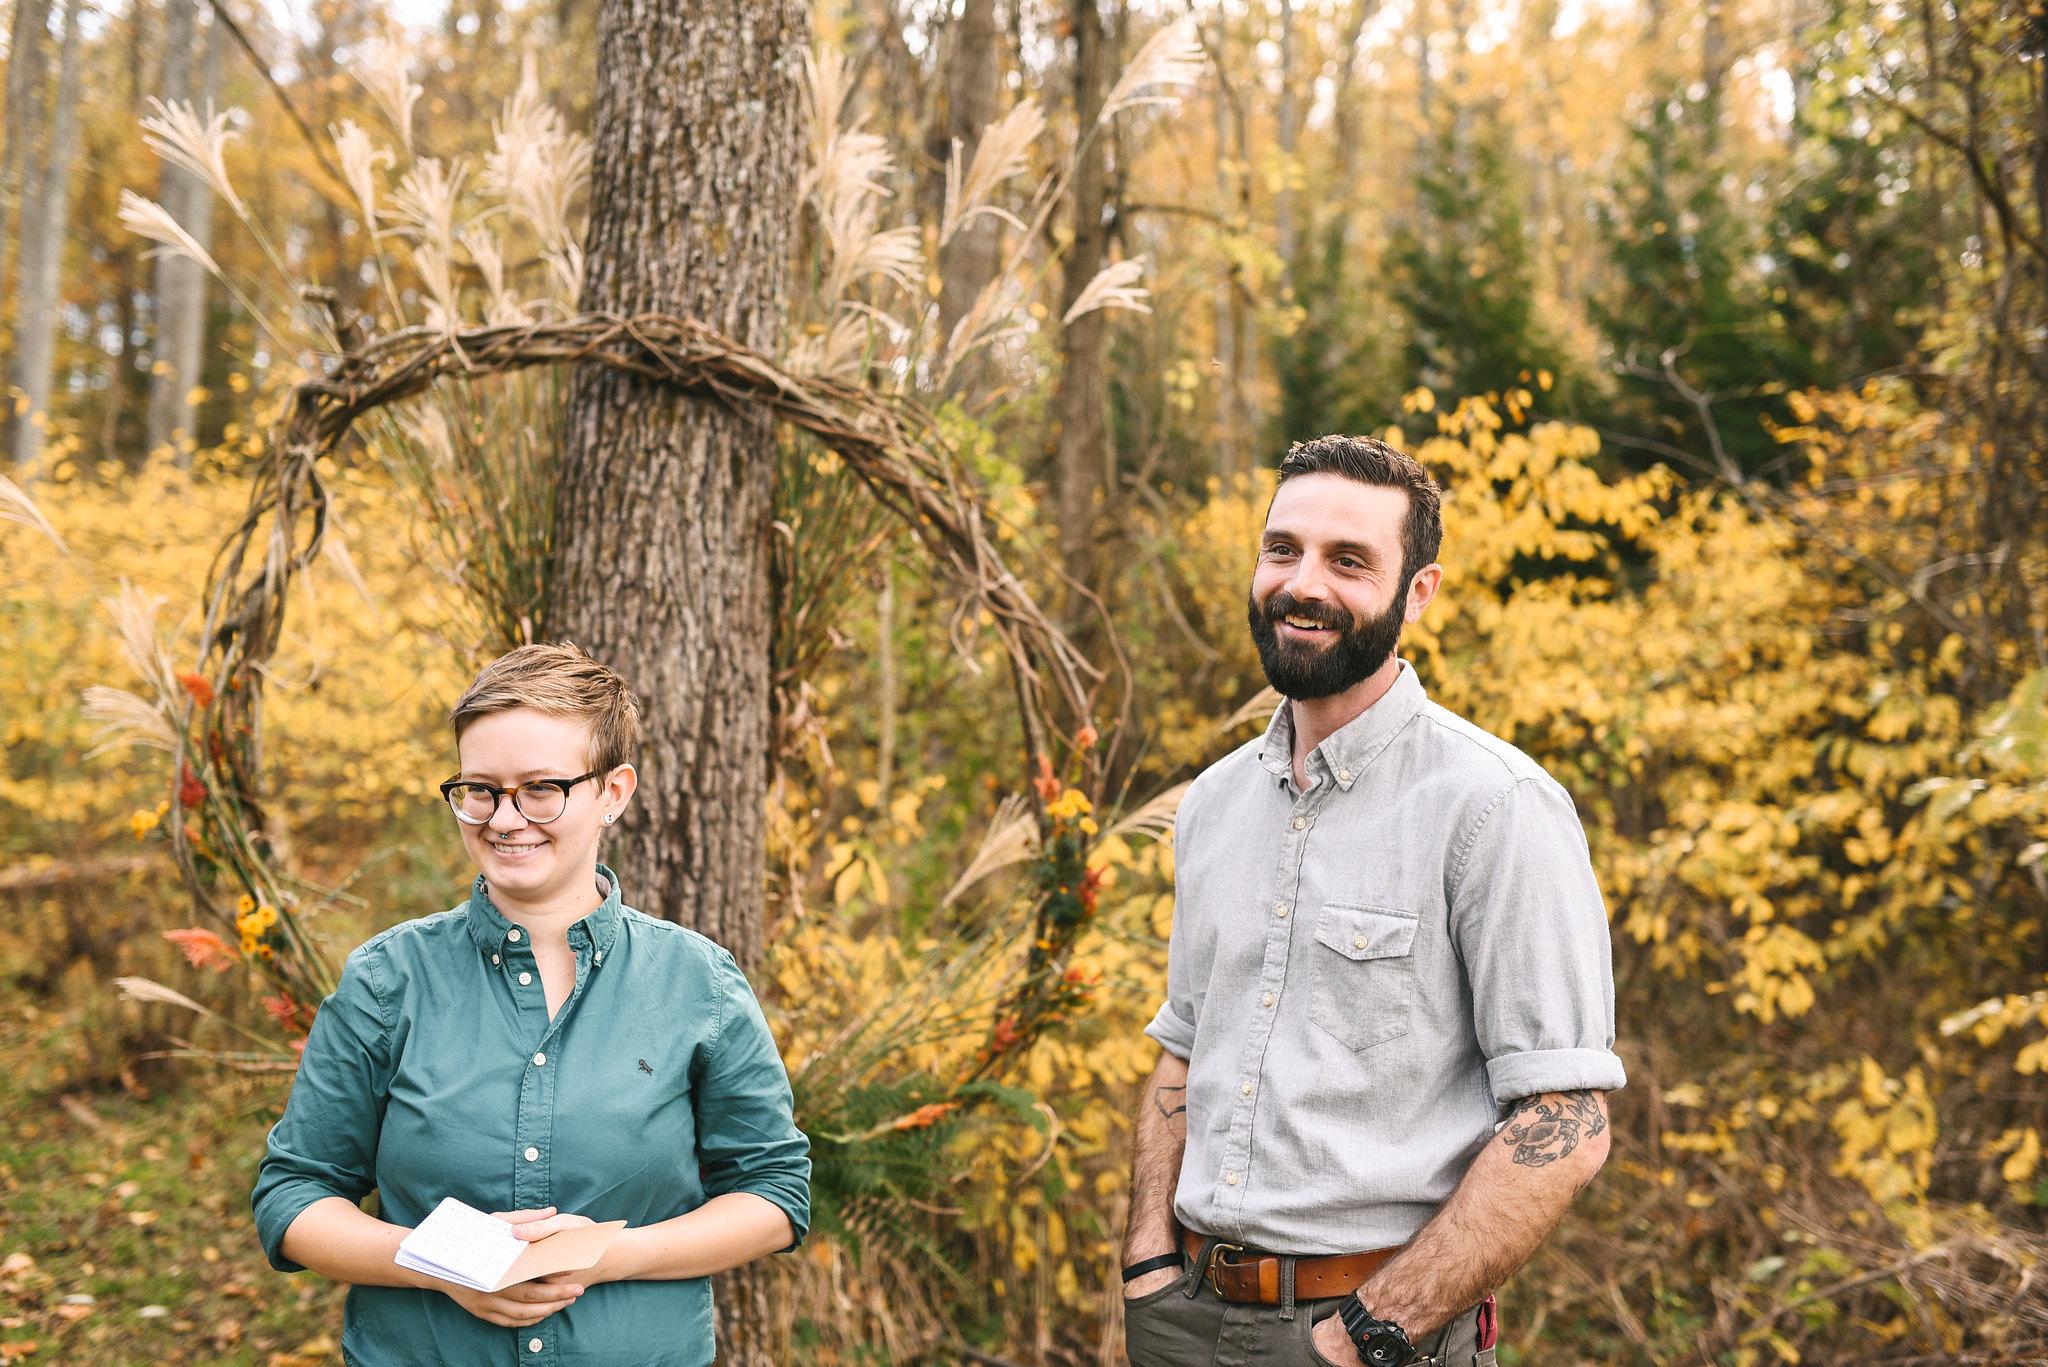 Baltimore, Maryland Wedding Photographer, Backyard Wedding, DIY, Rustic, Casual, Fall Wedding, Woodland, Groom Standing with Officiant